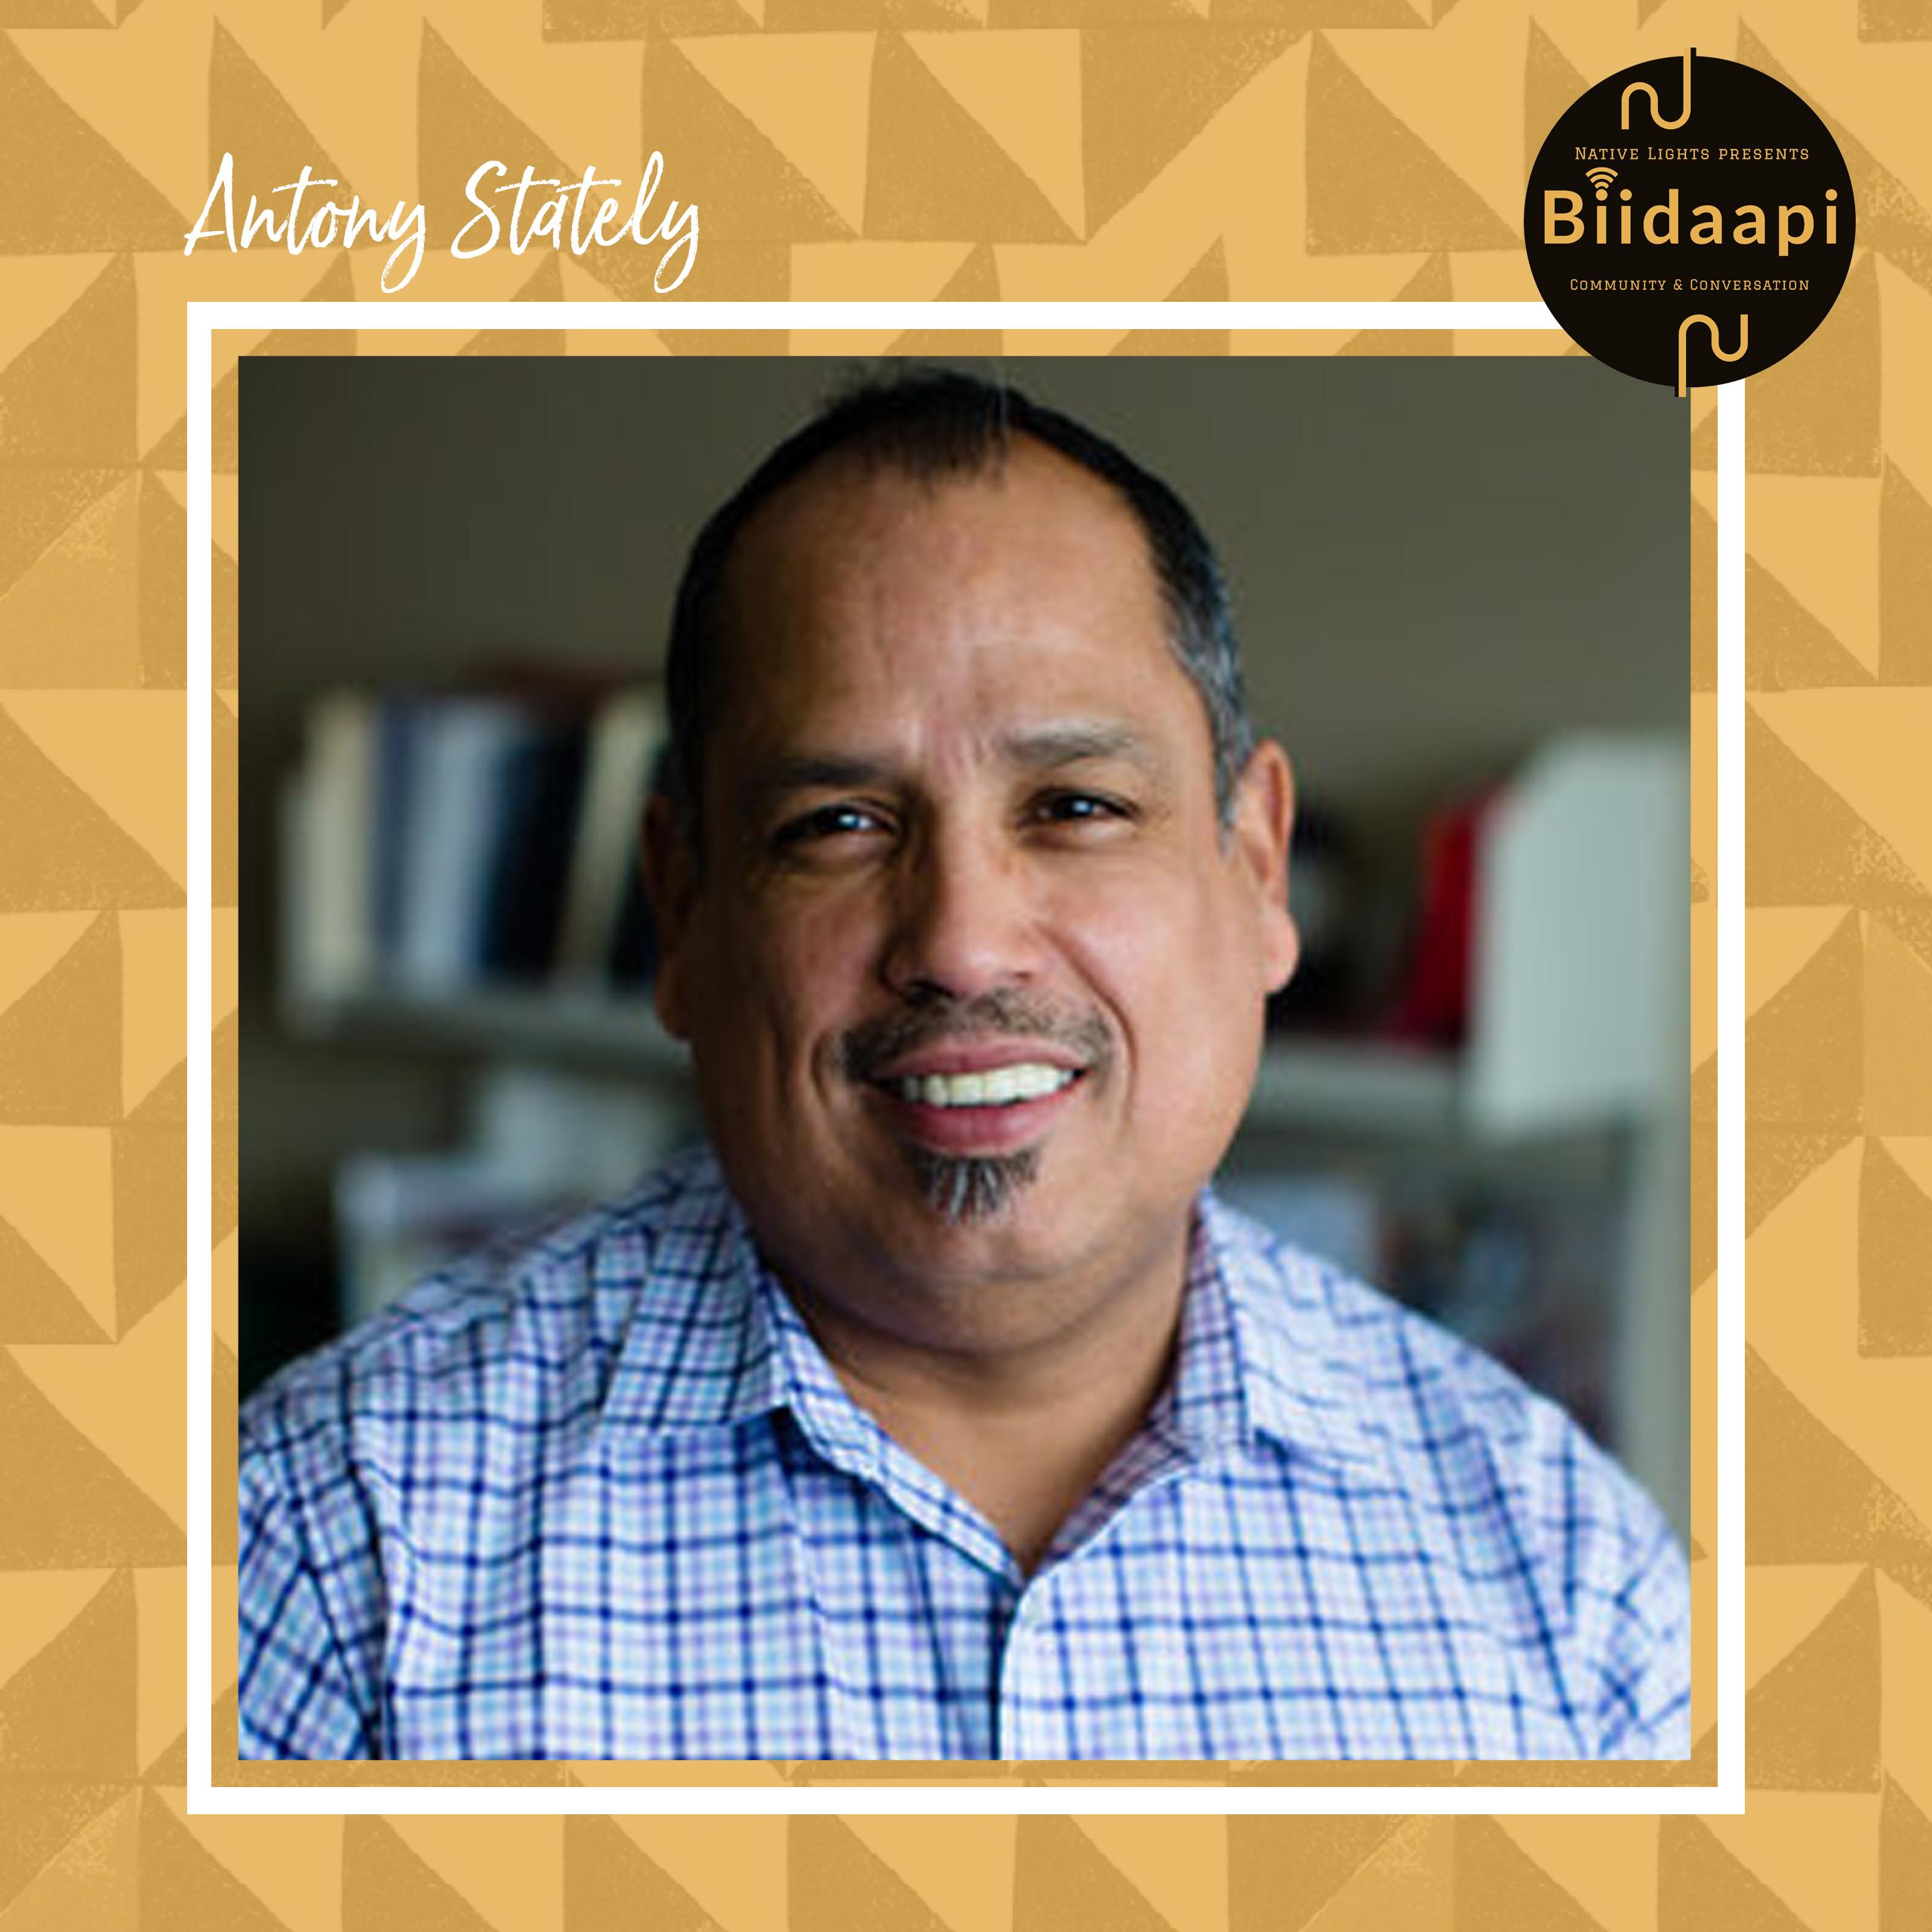 NL: Biidaapi – Antony Stately